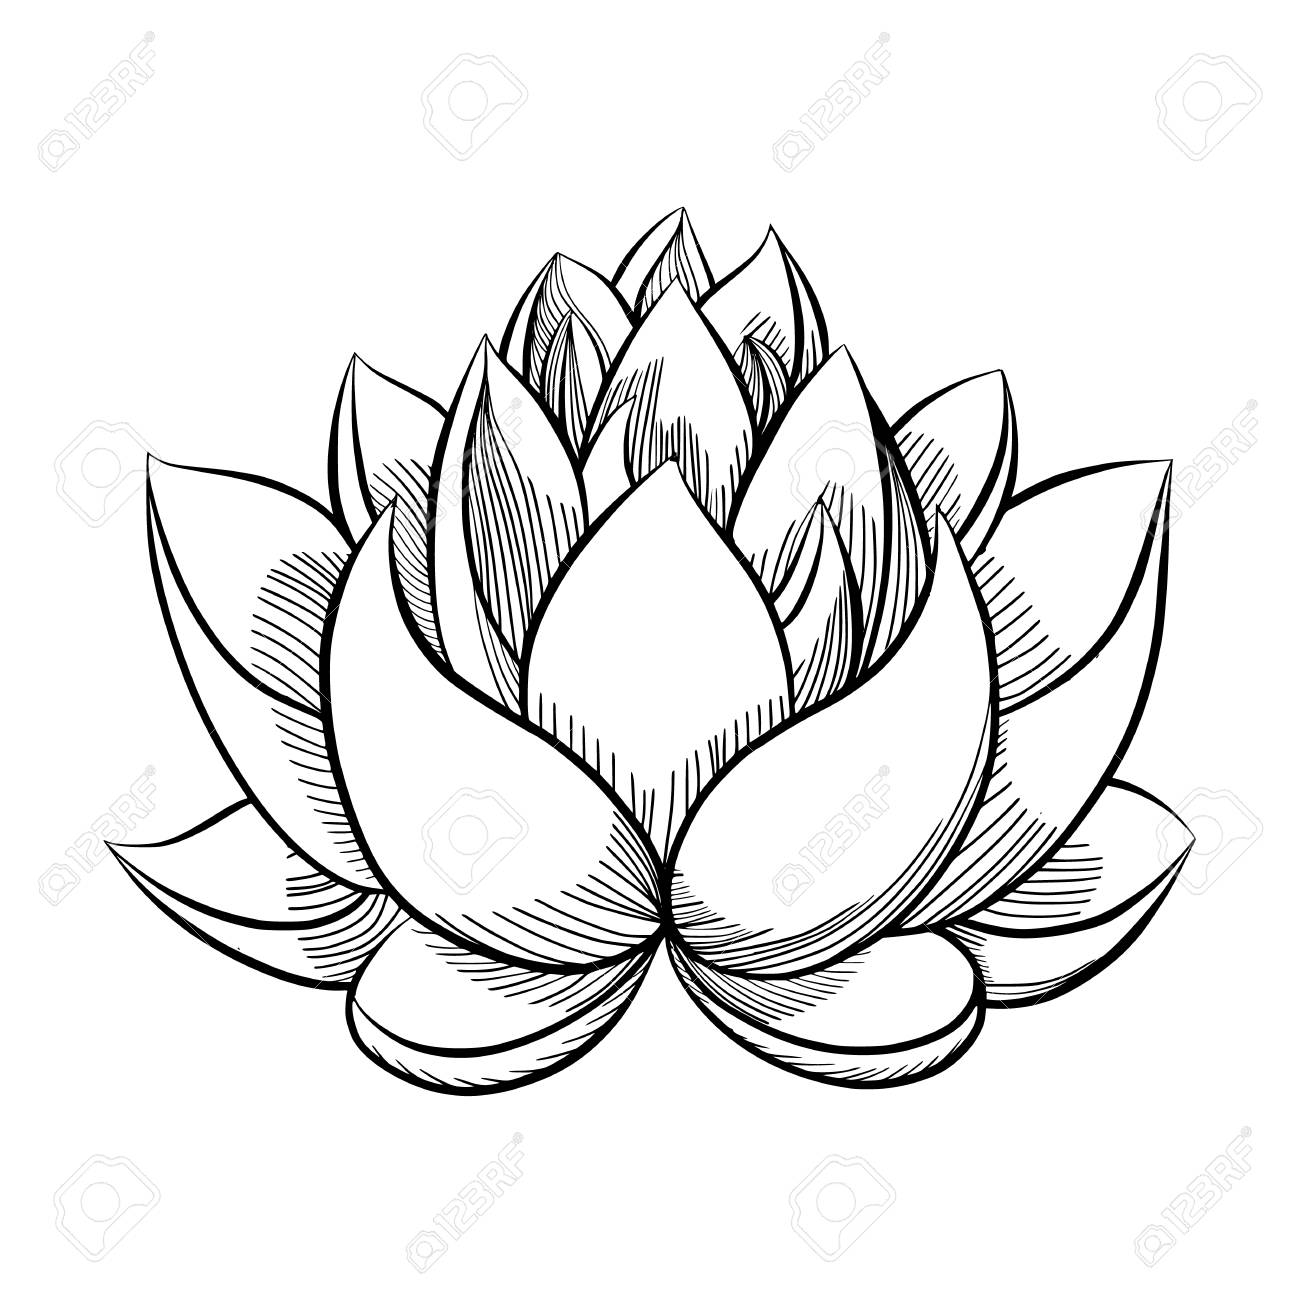 Sketch of lotus flower images fresh lotus flowers hand drawn sketch of lotus flower royalty free cliparts vectors izmirmasajfo